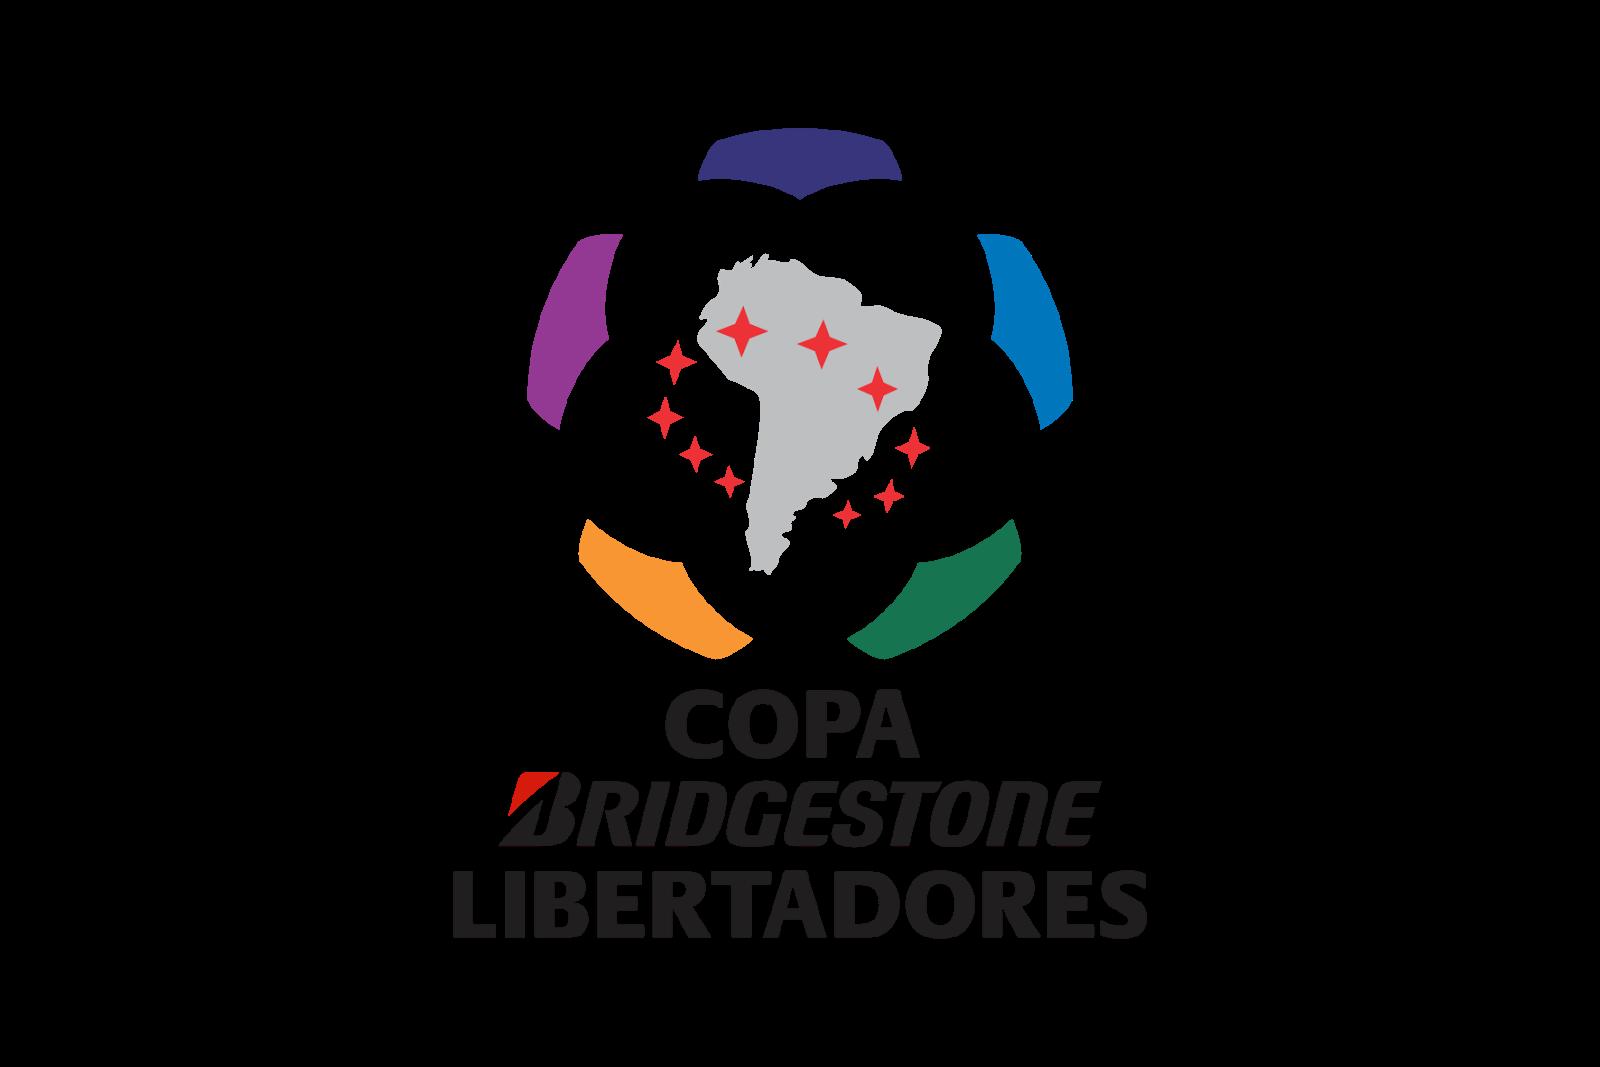 Copa Bridgestone Libertadores Vector Logo. » - Copa America Logo Vector PNG